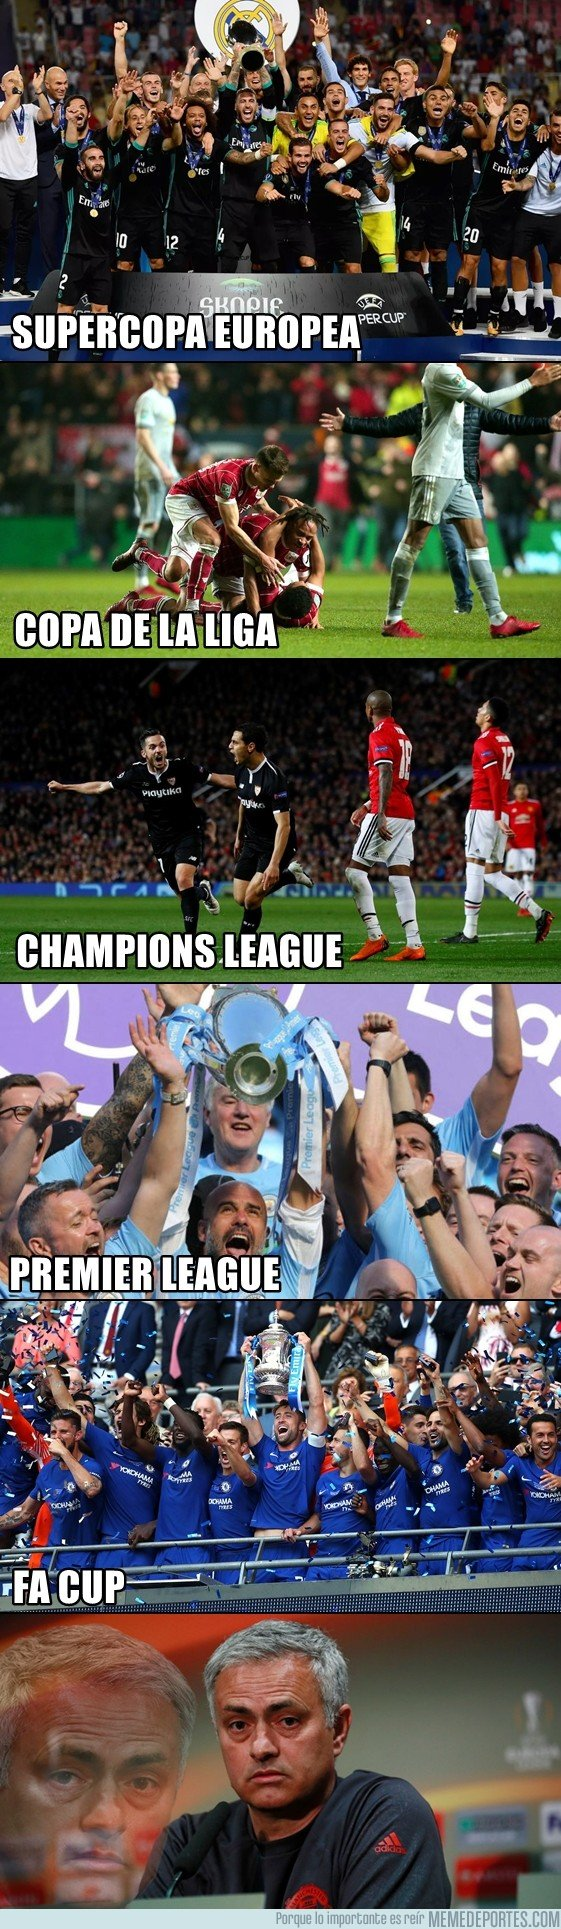 1034426 - Otro año en blanco de Mourinho